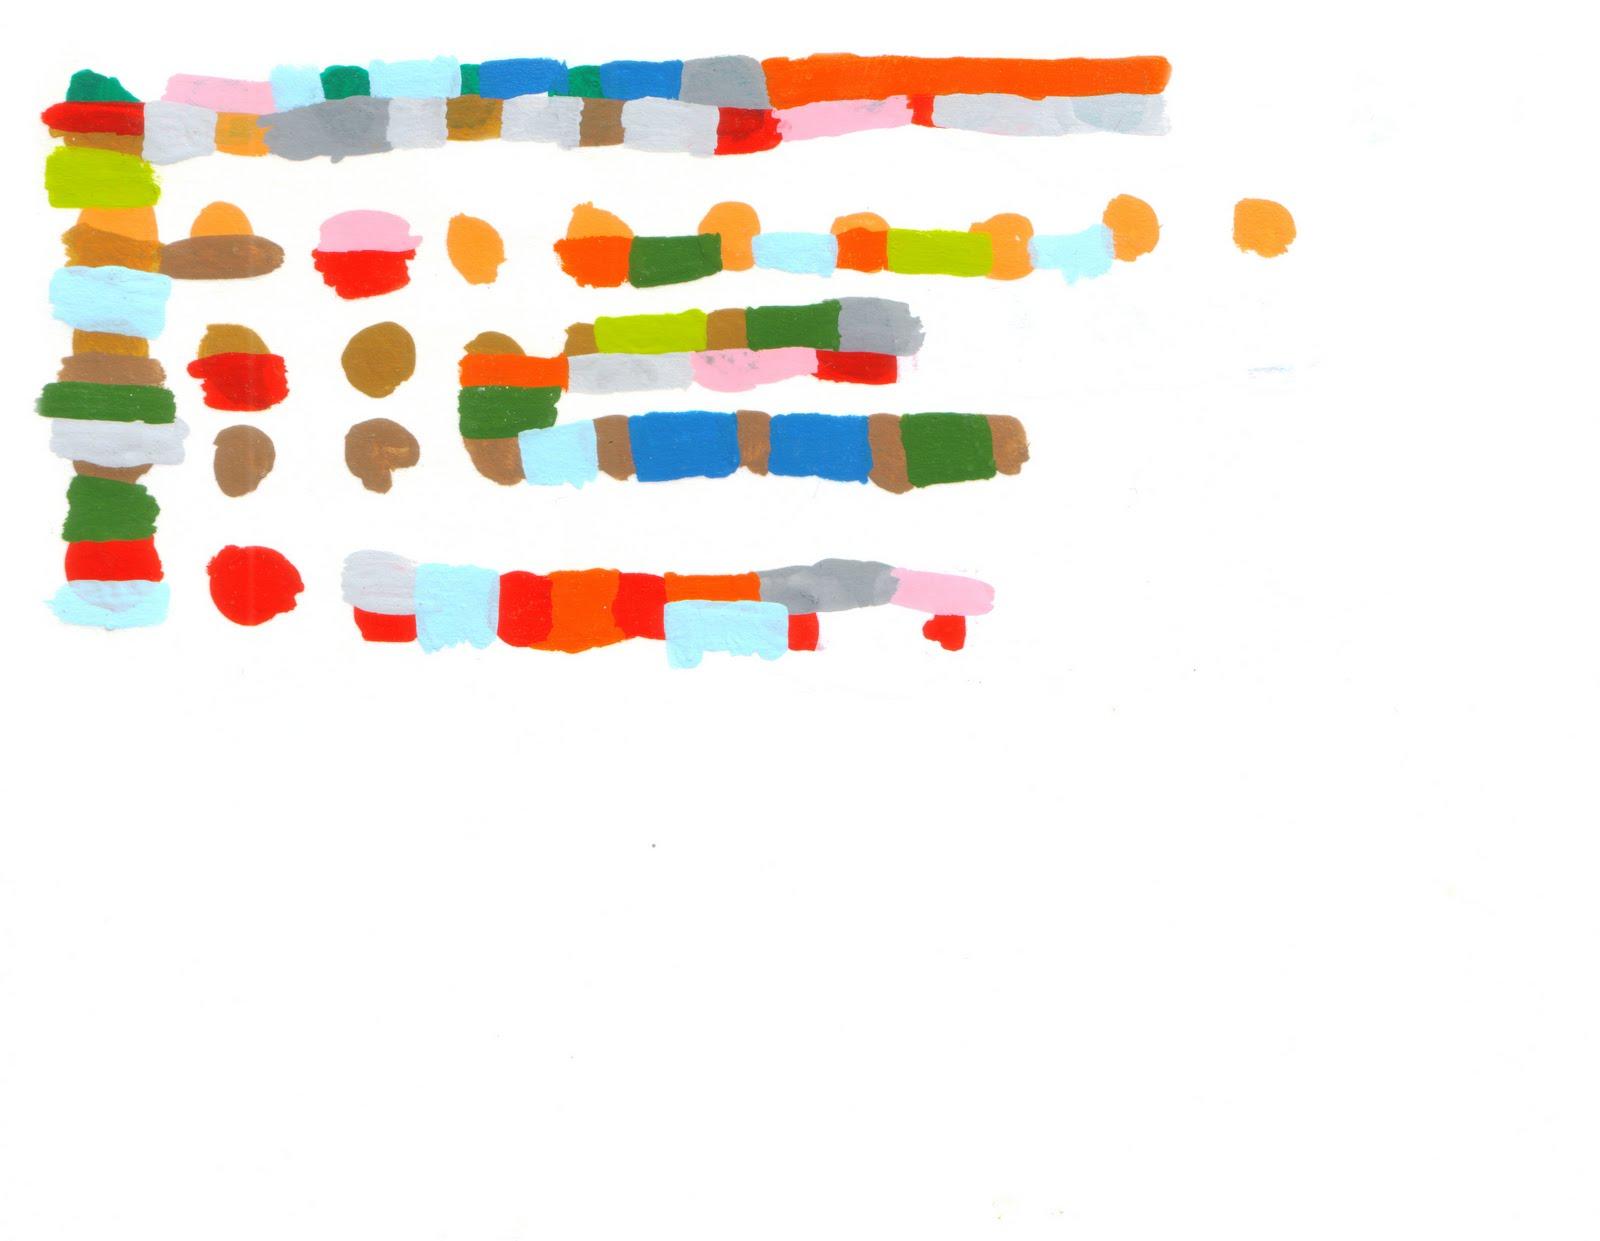 http://4.bp.blogspot.com/_LgDjnlJbCSg/SwSjNmmHQpI/AAAAAAAABAM/0ZSYWlUipYw/s1600/chart2.jpg